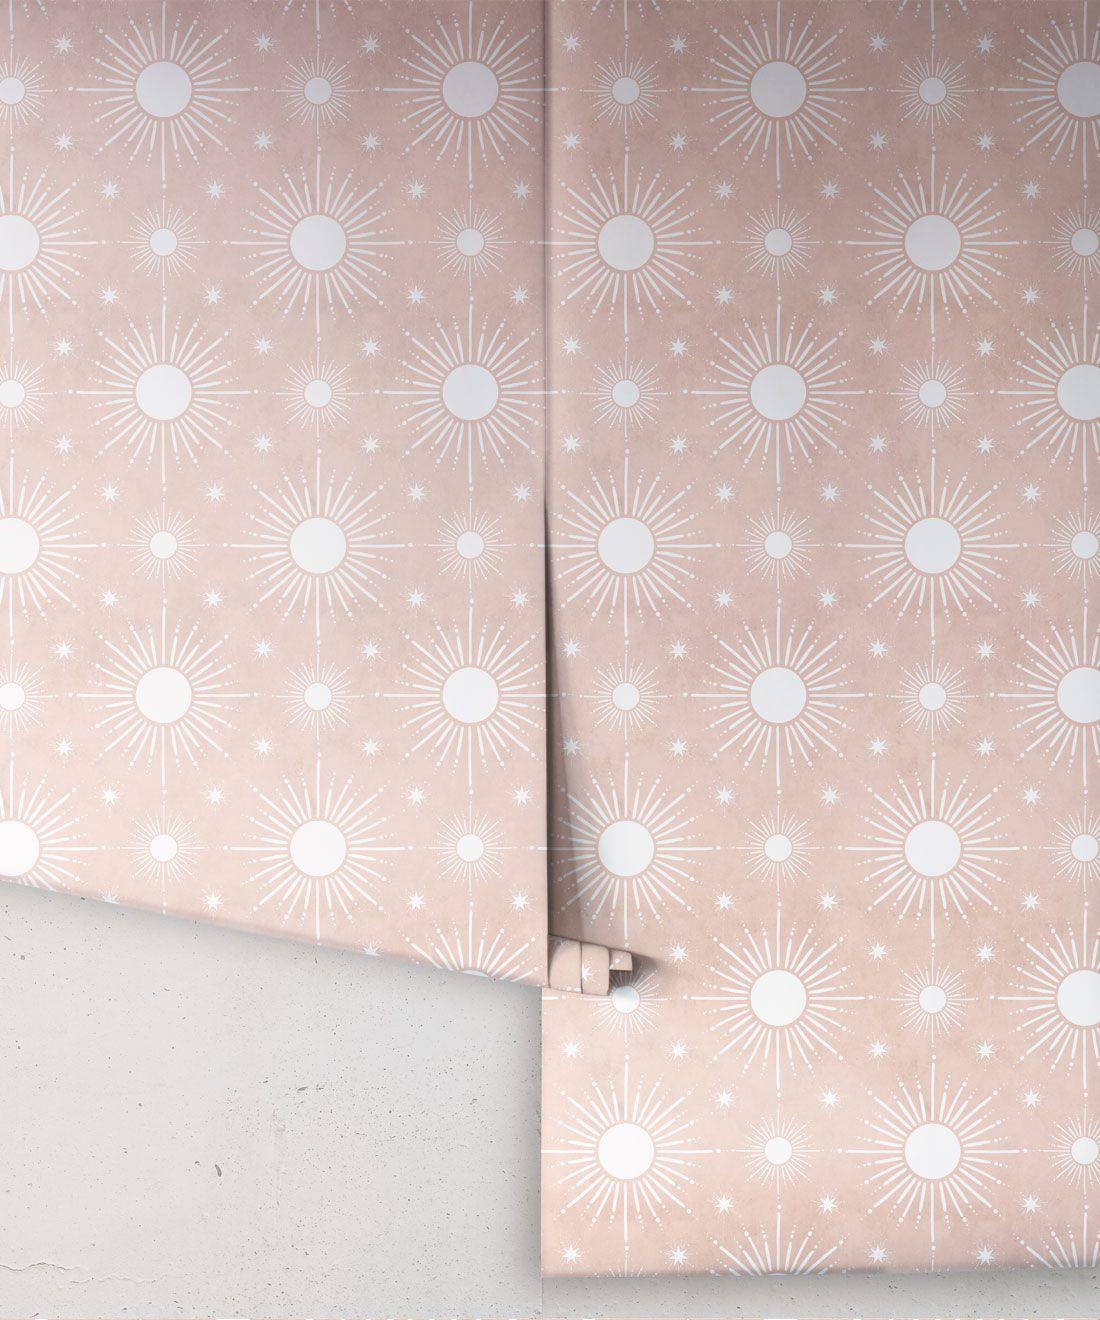 Sun Light Star Bright Wallpaper • Dusty Pink • Rolls